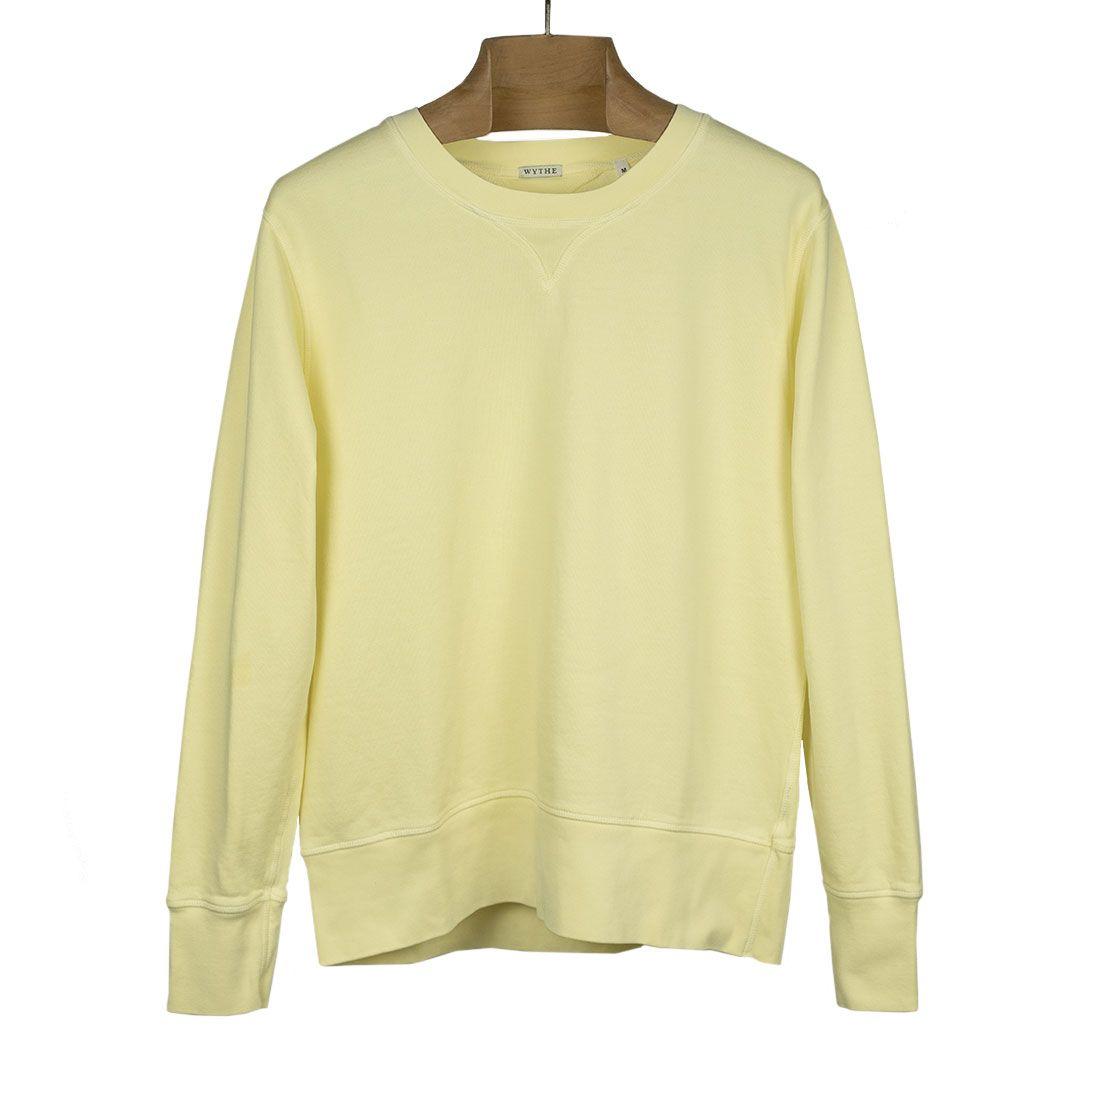 20210409 NMWA Wythe Crewneck sweatshirt in lemonade yellow cotton 01.jpg